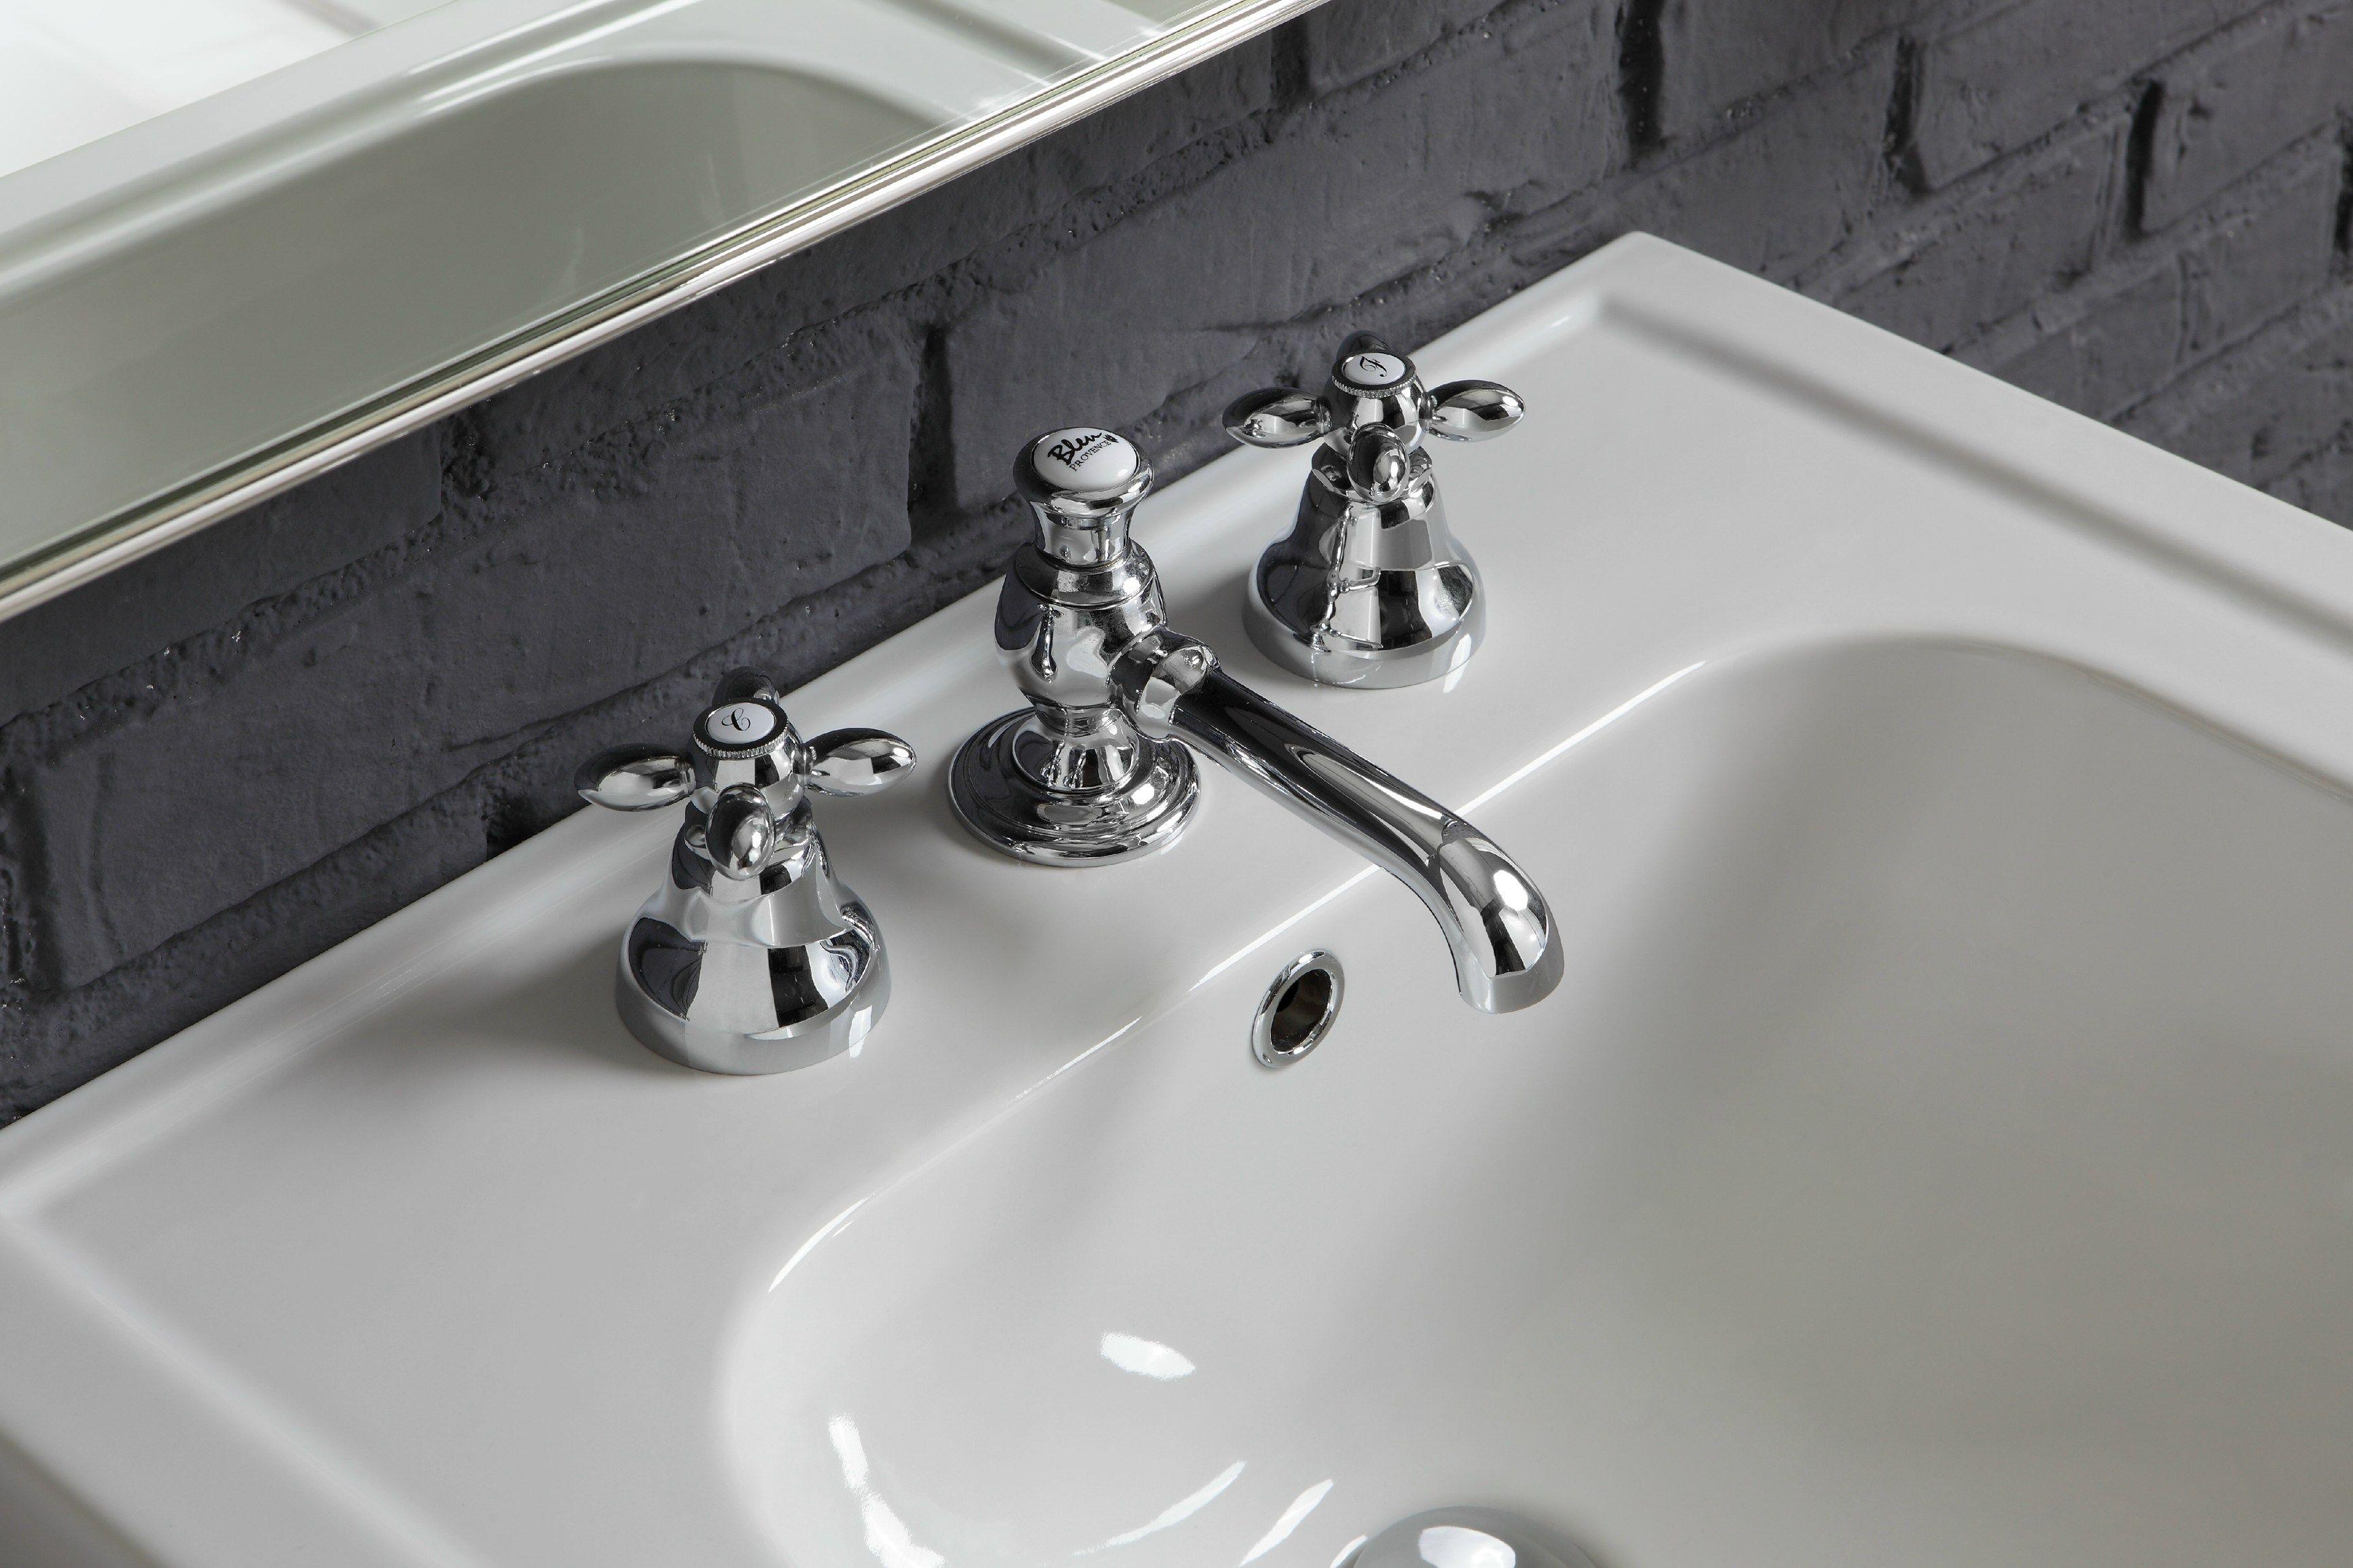 lavabo console rectangulaire en c ramique 960 collection provence 39 900 by bleu provence. Black Bedroom Furniture Sets. Home Design Ideas